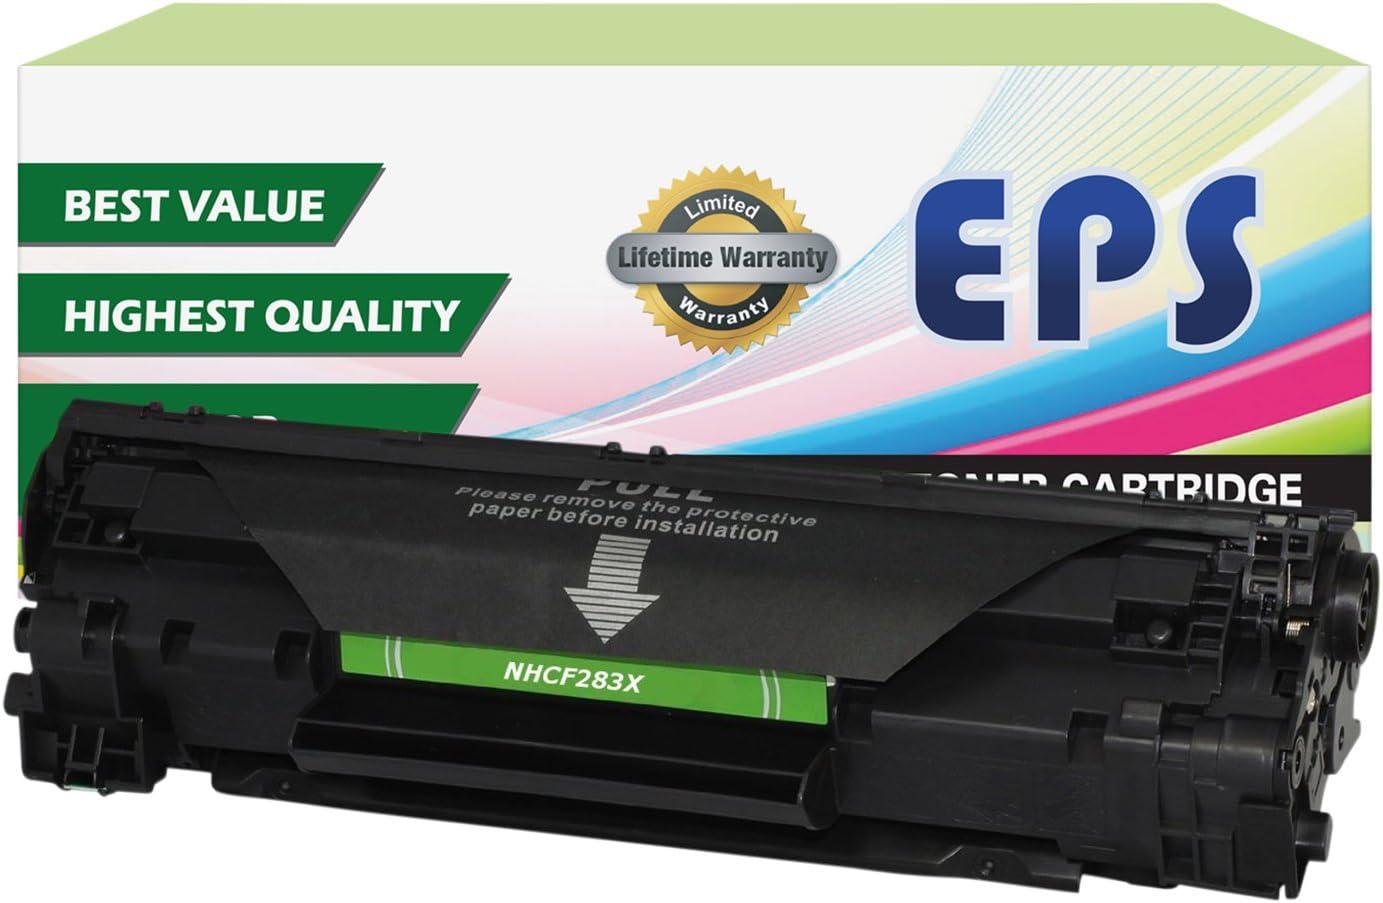 EPS Replacement 83X CF283X High Yield Toner for HP Laserjet Pro M225DN M225DW M201DW